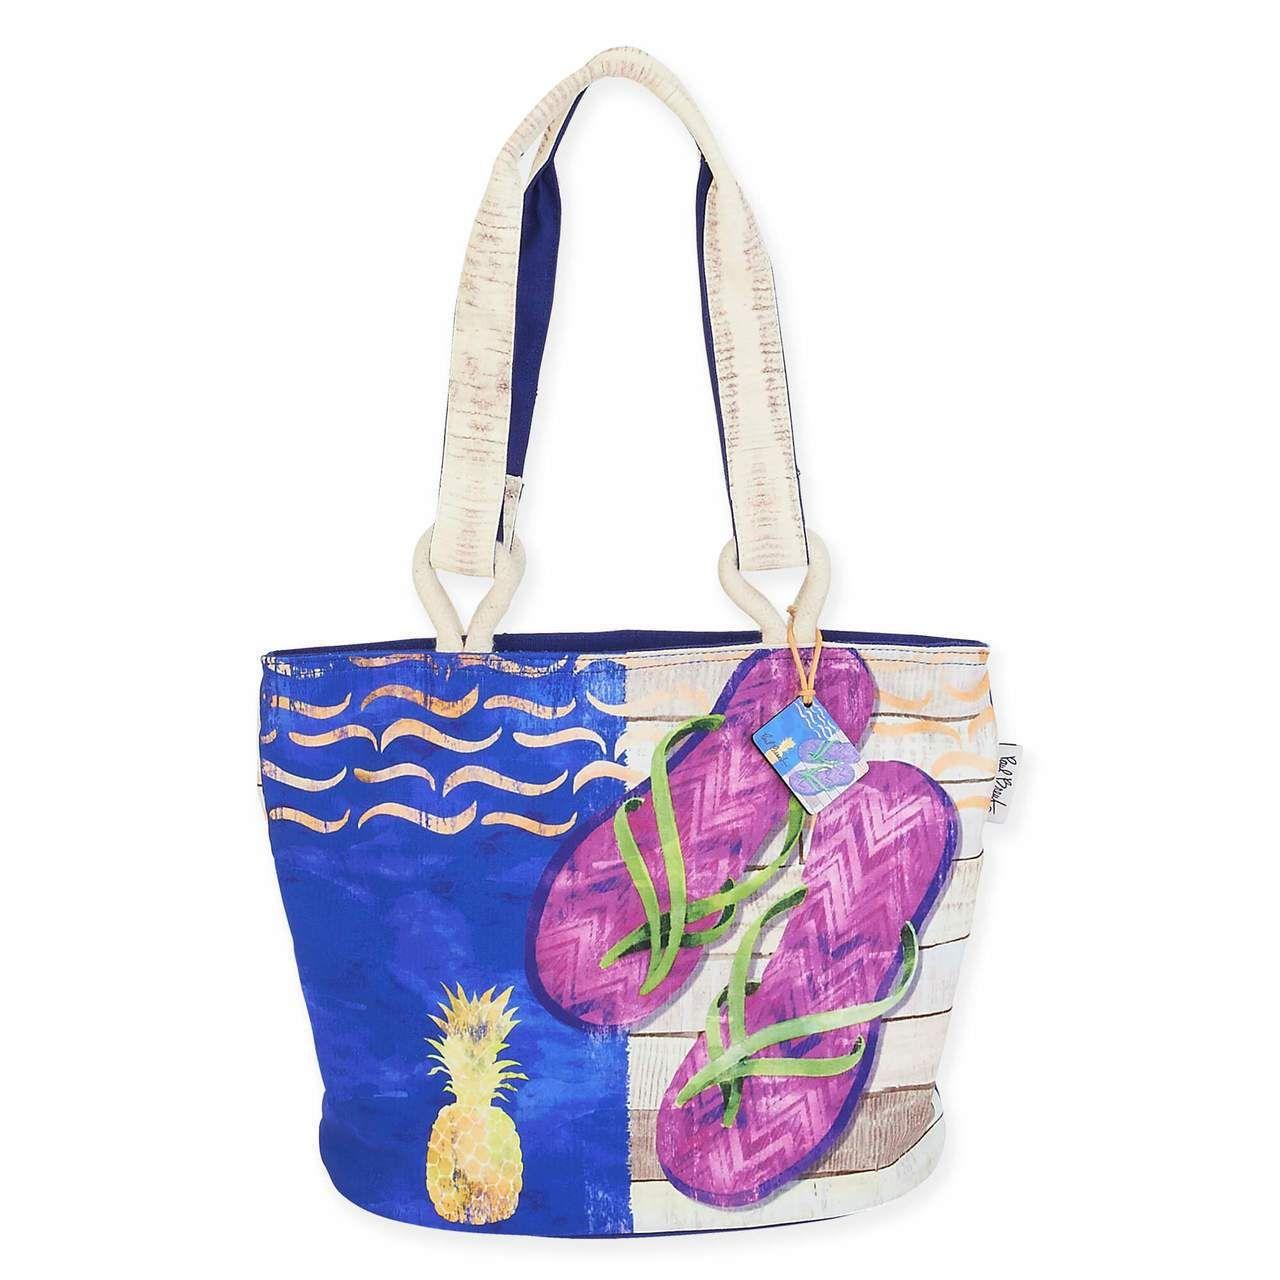 a6df6a64f544 Sunshine & Sandals Medium Tote Beach Bag   Products   Beach tote ...